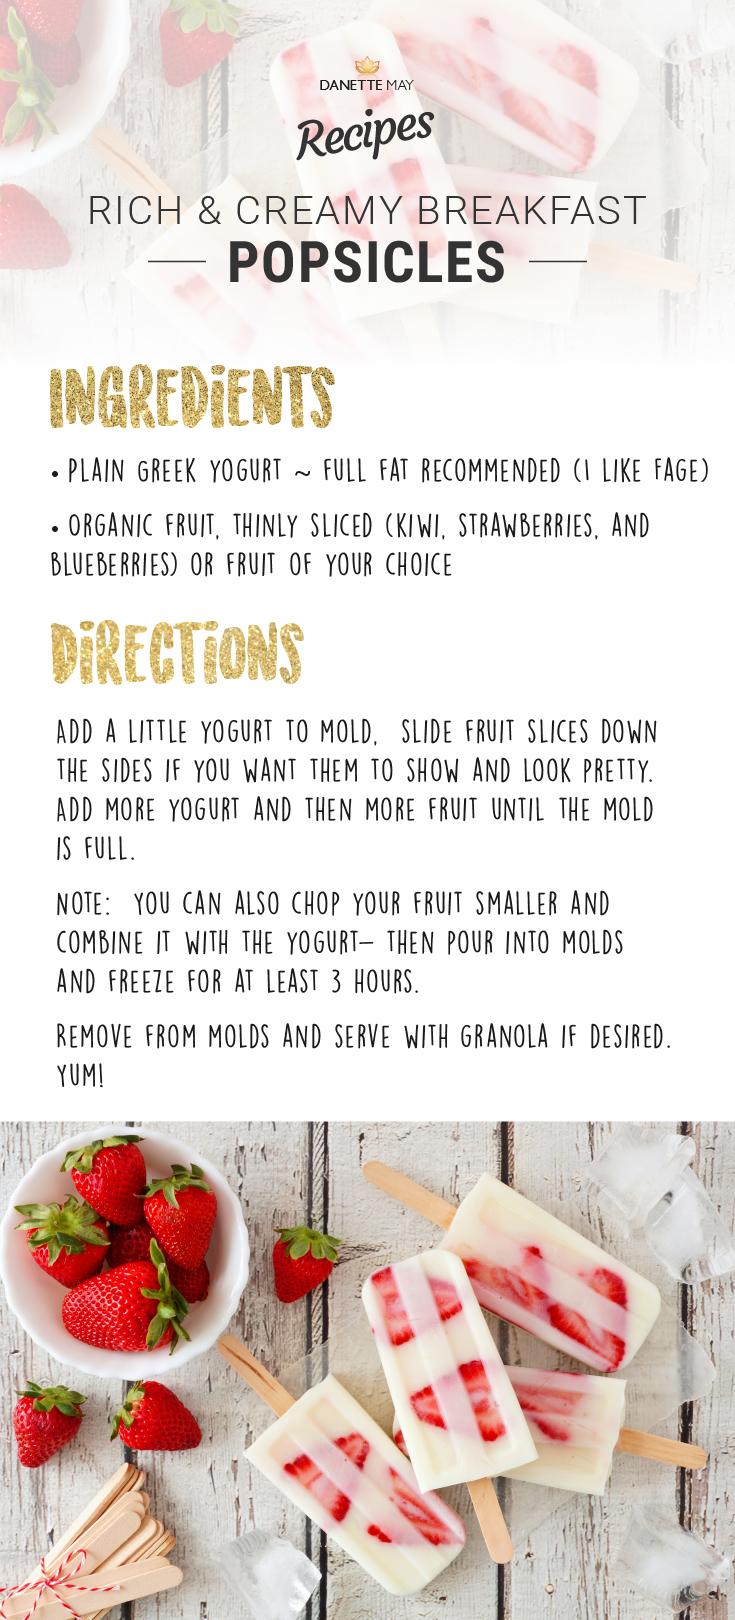 Danette May Recipe